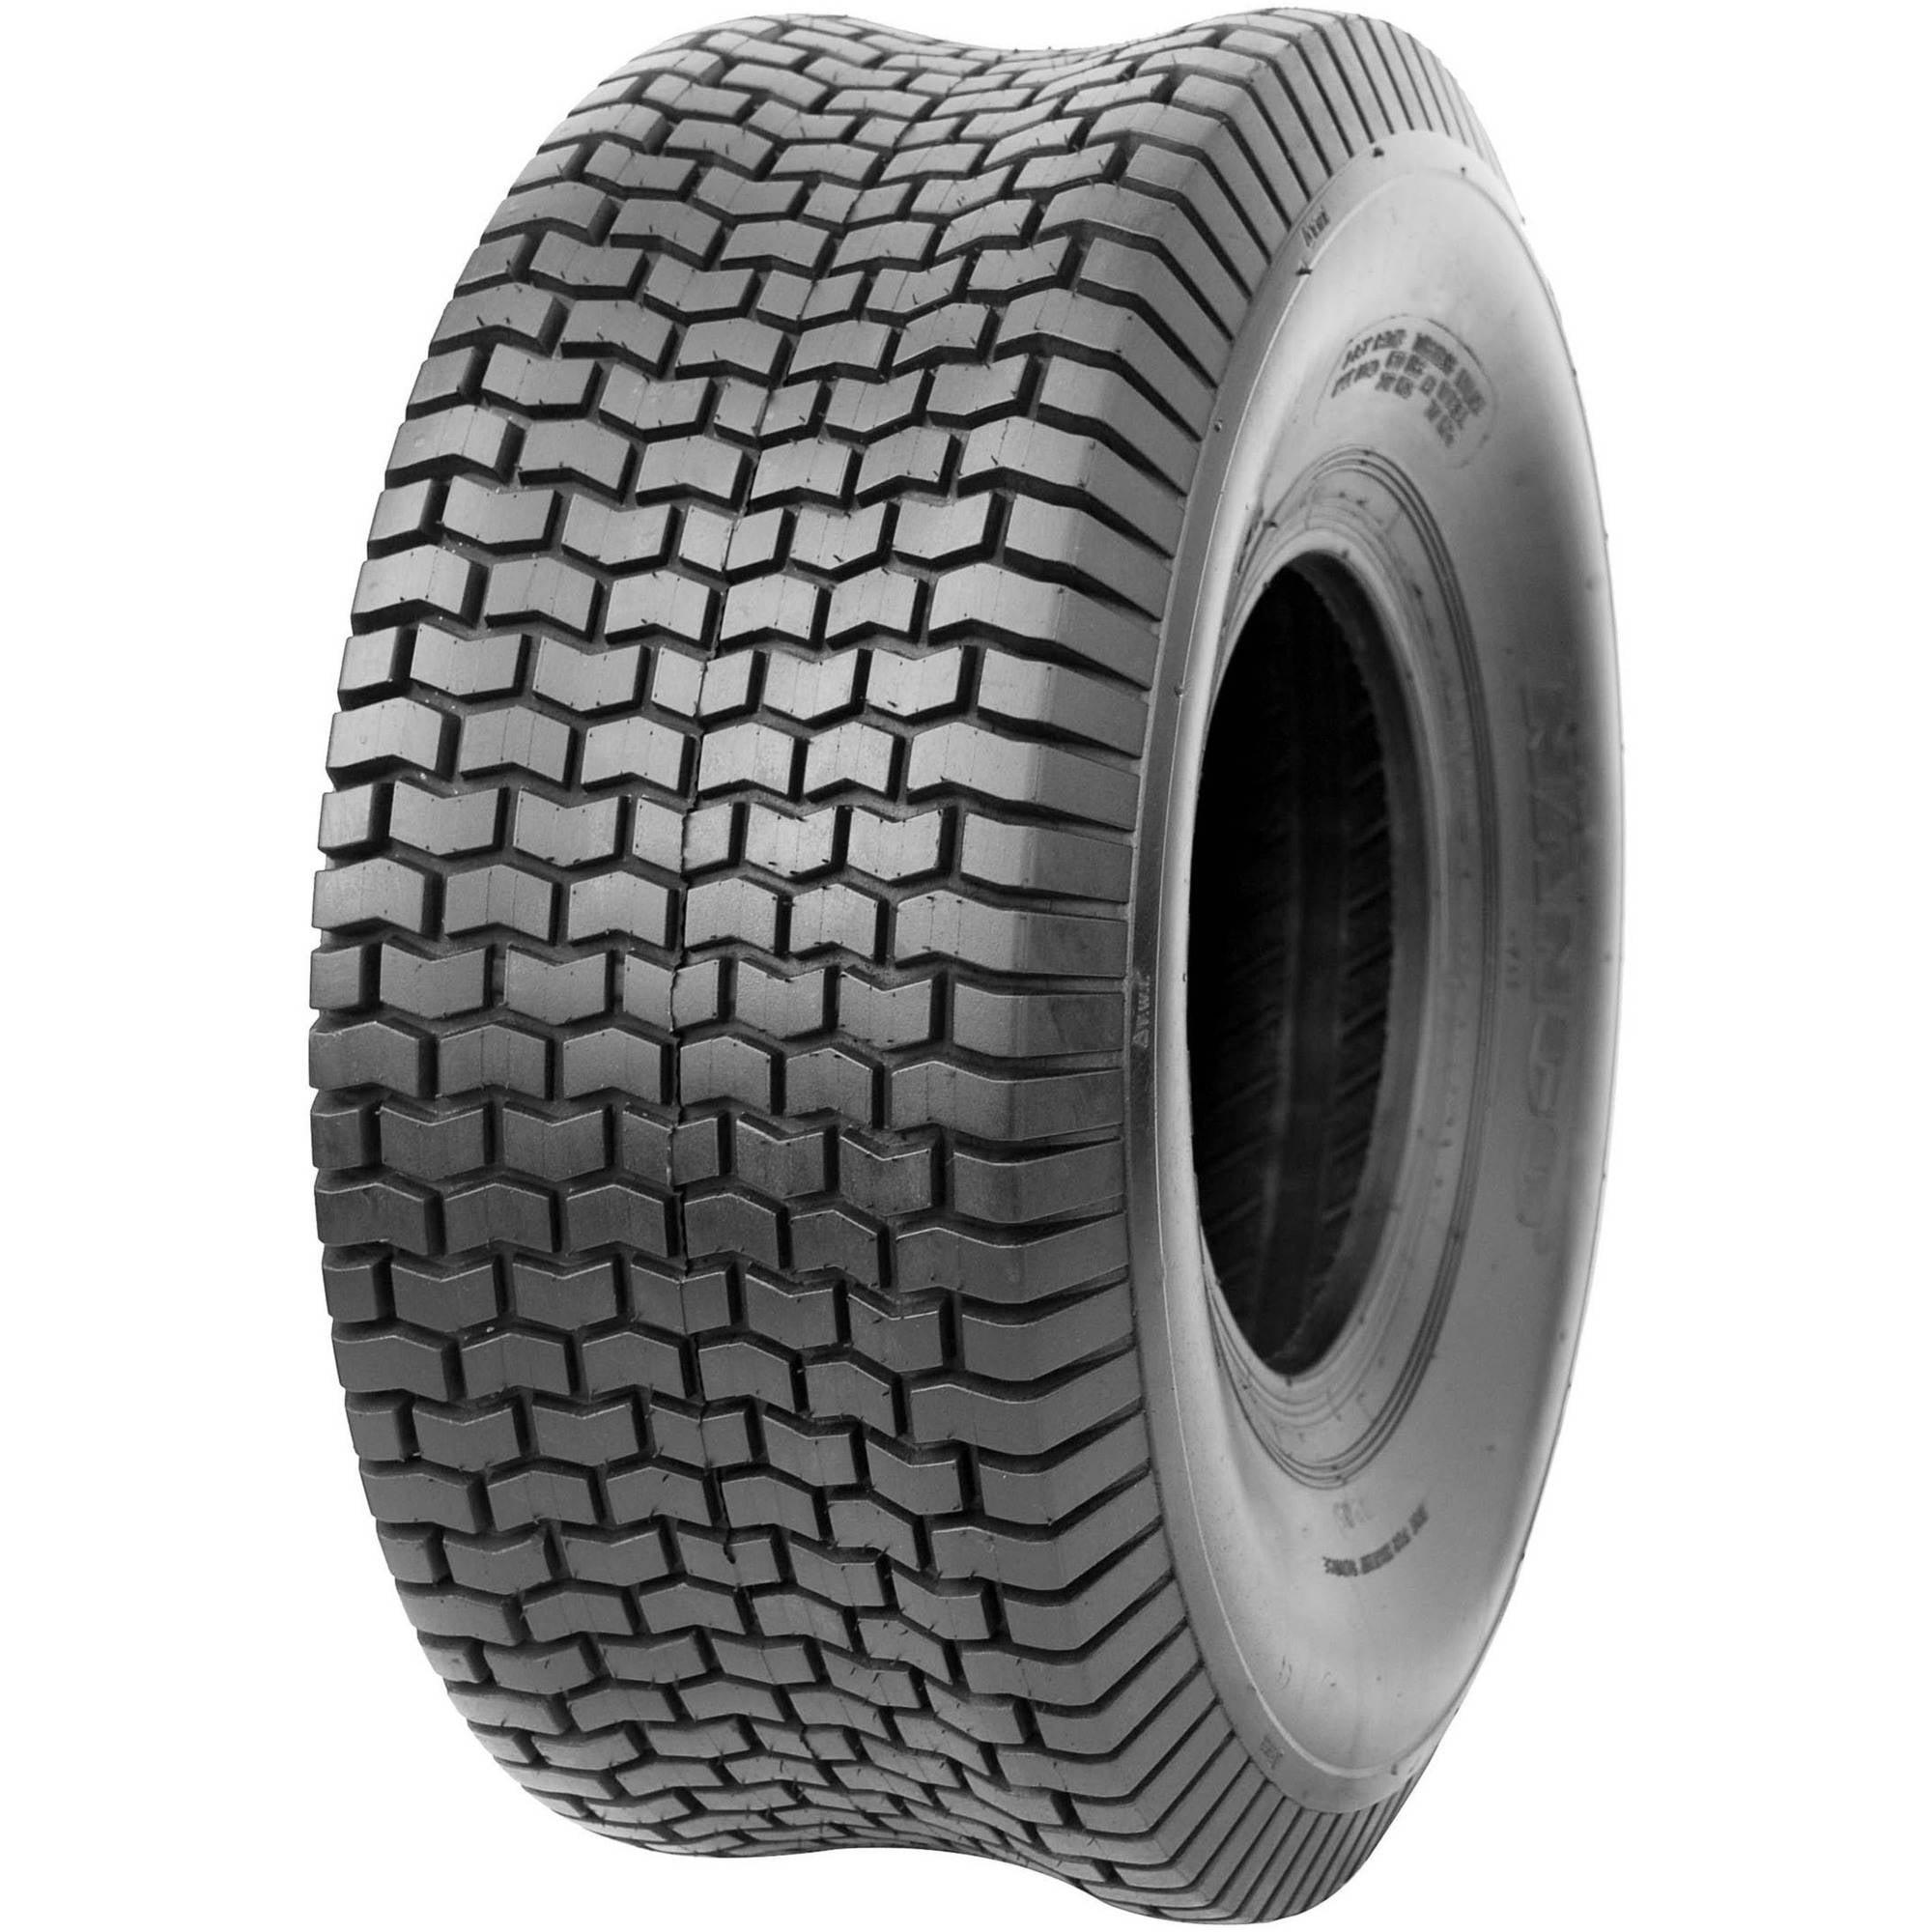 HI-RUN Turf Mate Tire 20x8.0-8 2PR